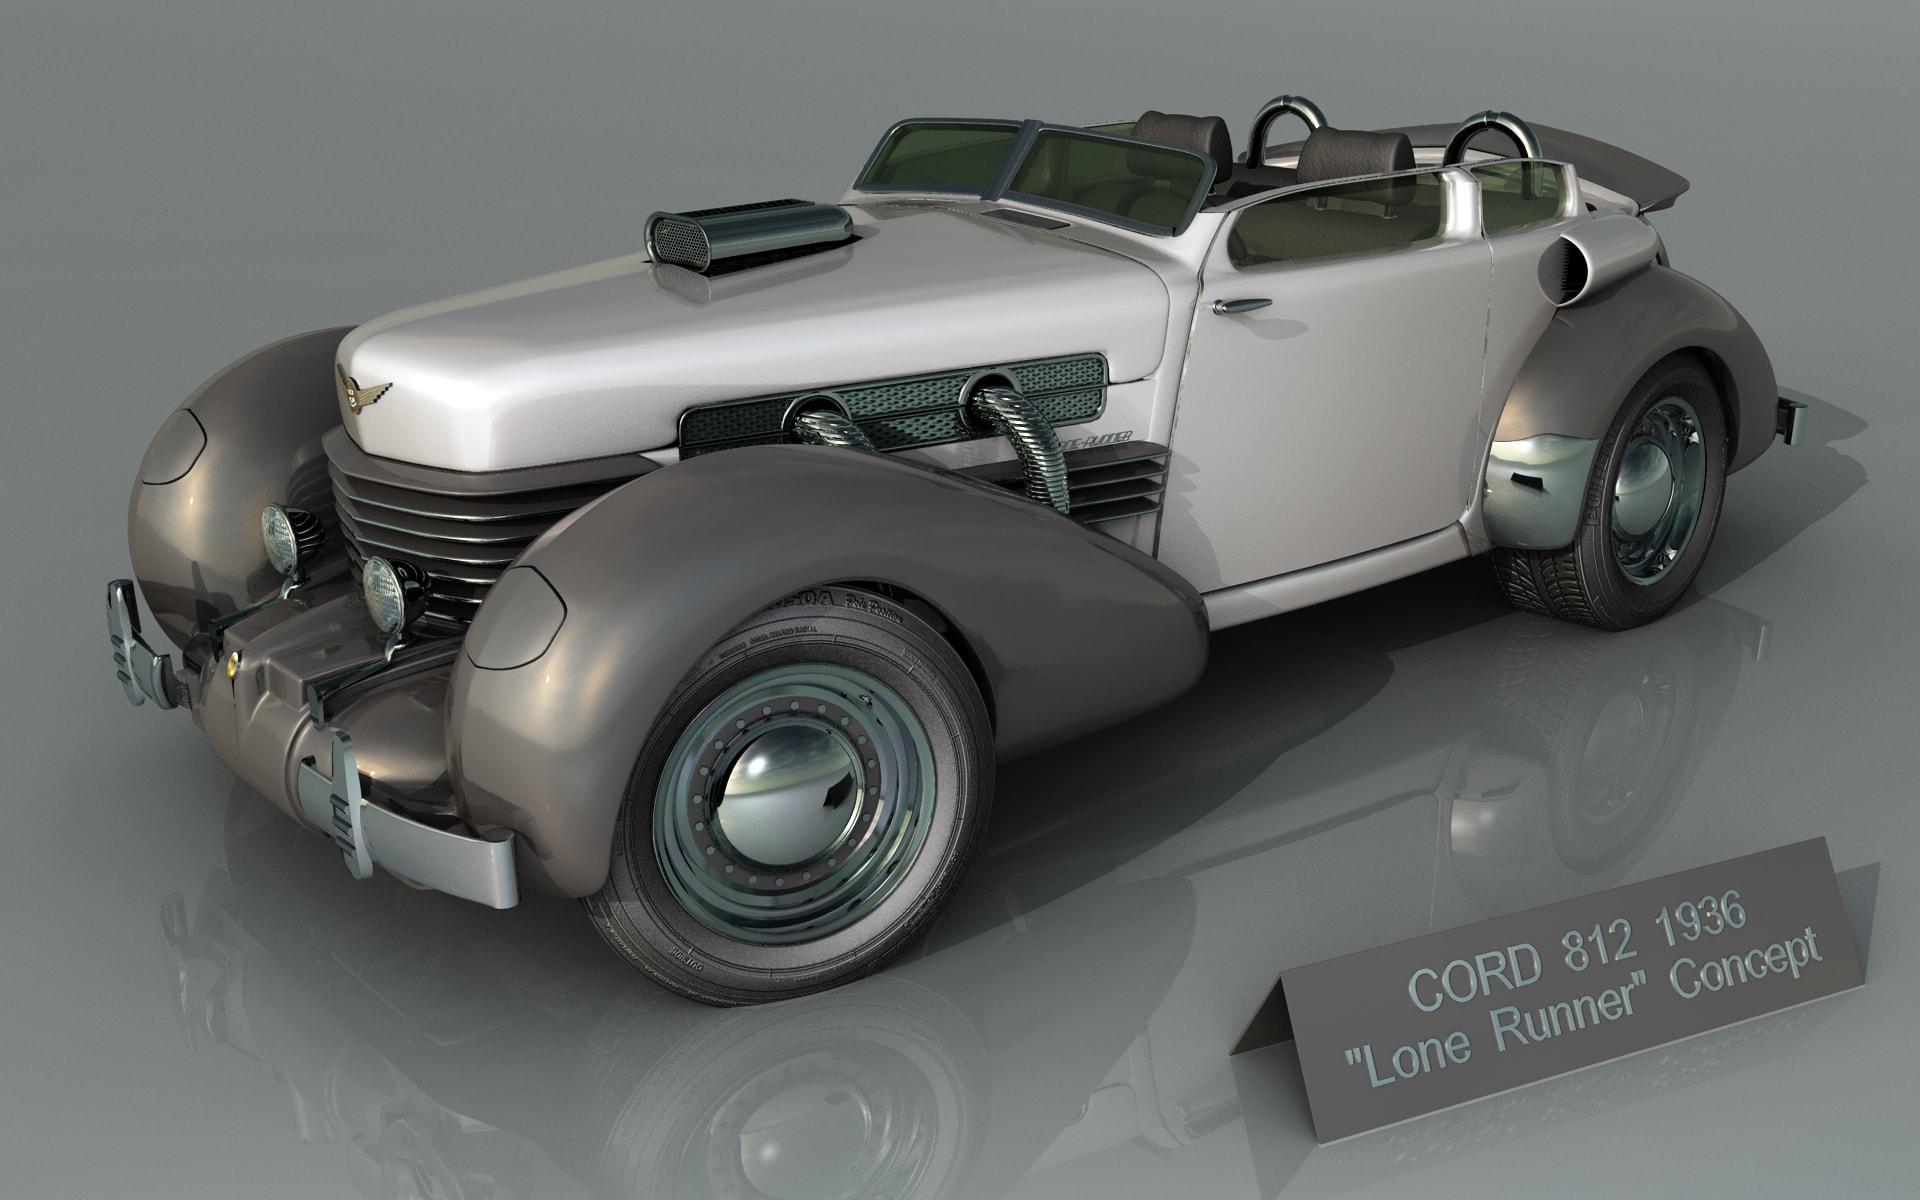 Cord 810/812 Free